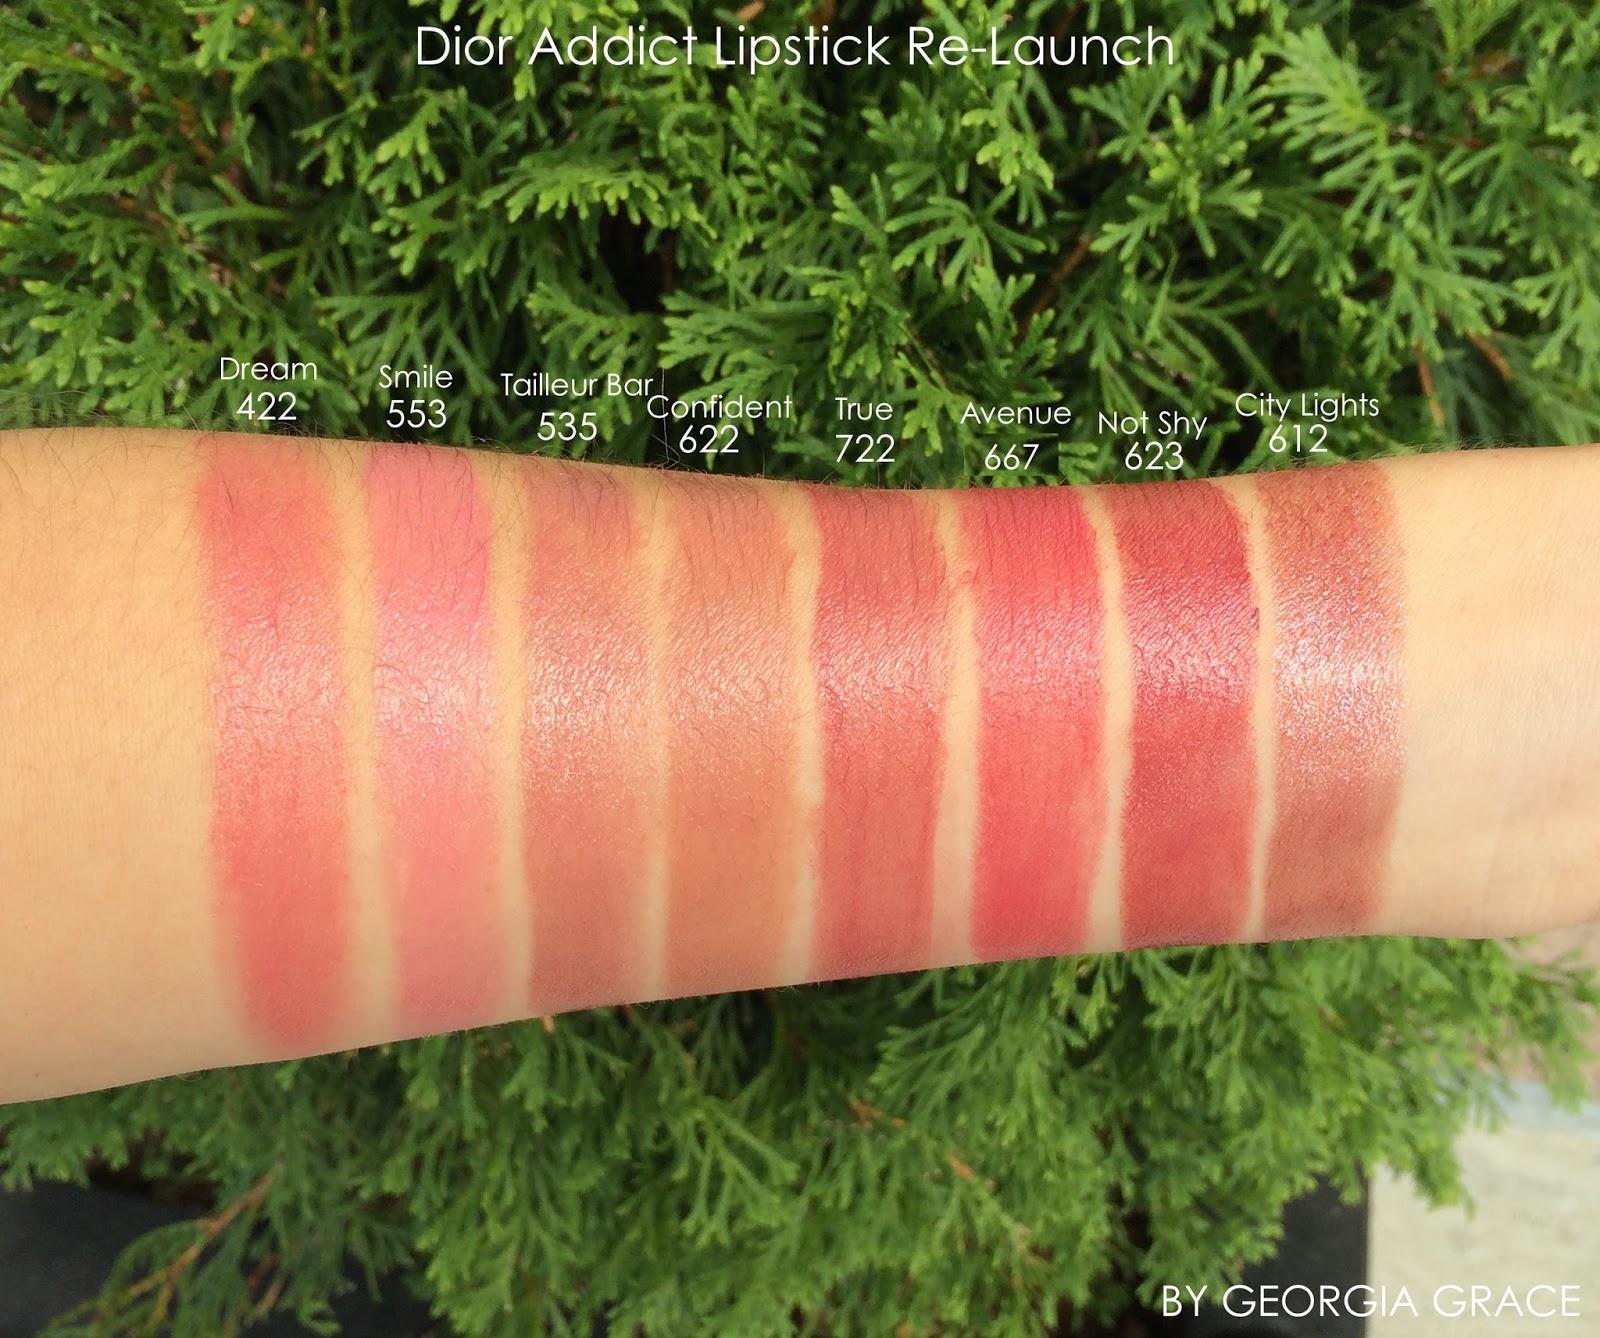 Addict Lipstick Hydra-Gel Core Mirror Shine by Dior #21